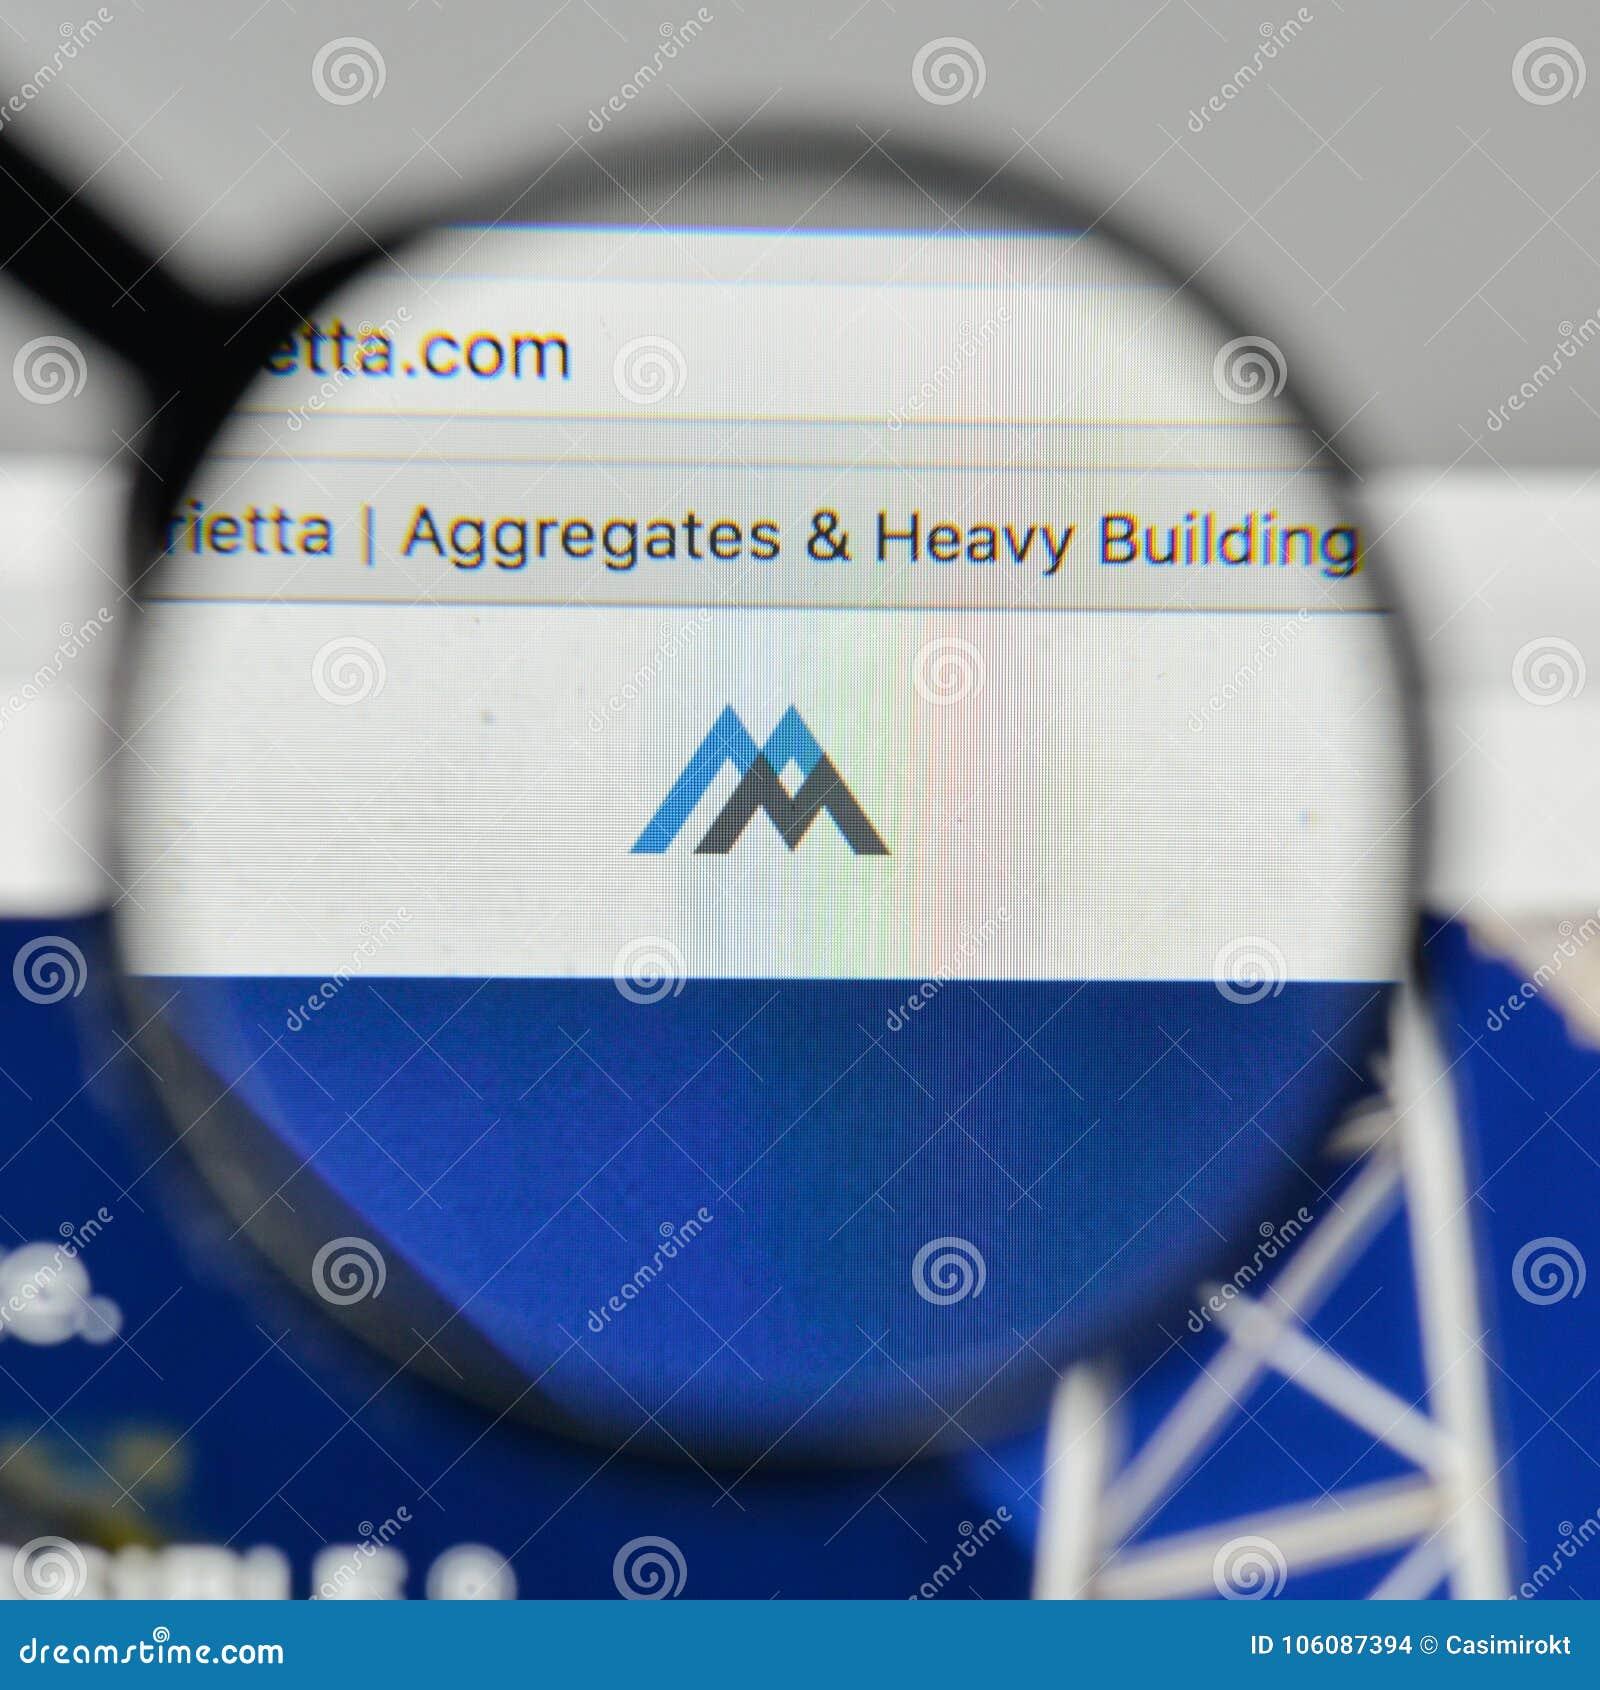 Милан, Италия - 1-ое ноября 2017: Логотип материалов Мартина Marietta